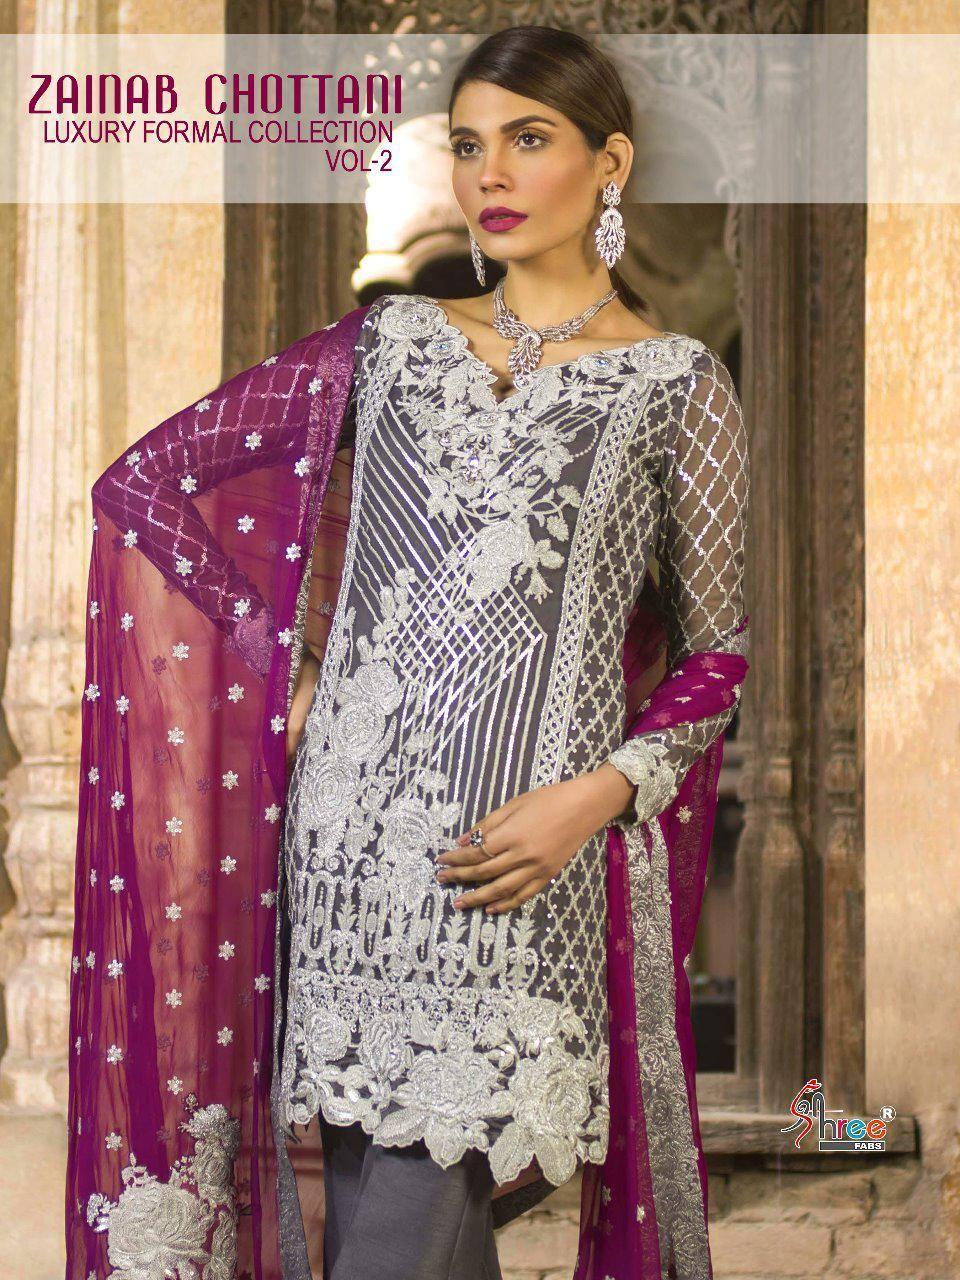 7021bbab29 Shree Fab Zainab Chottani Luxcury Formal Collection Vol-2 (8 Pc Set ...